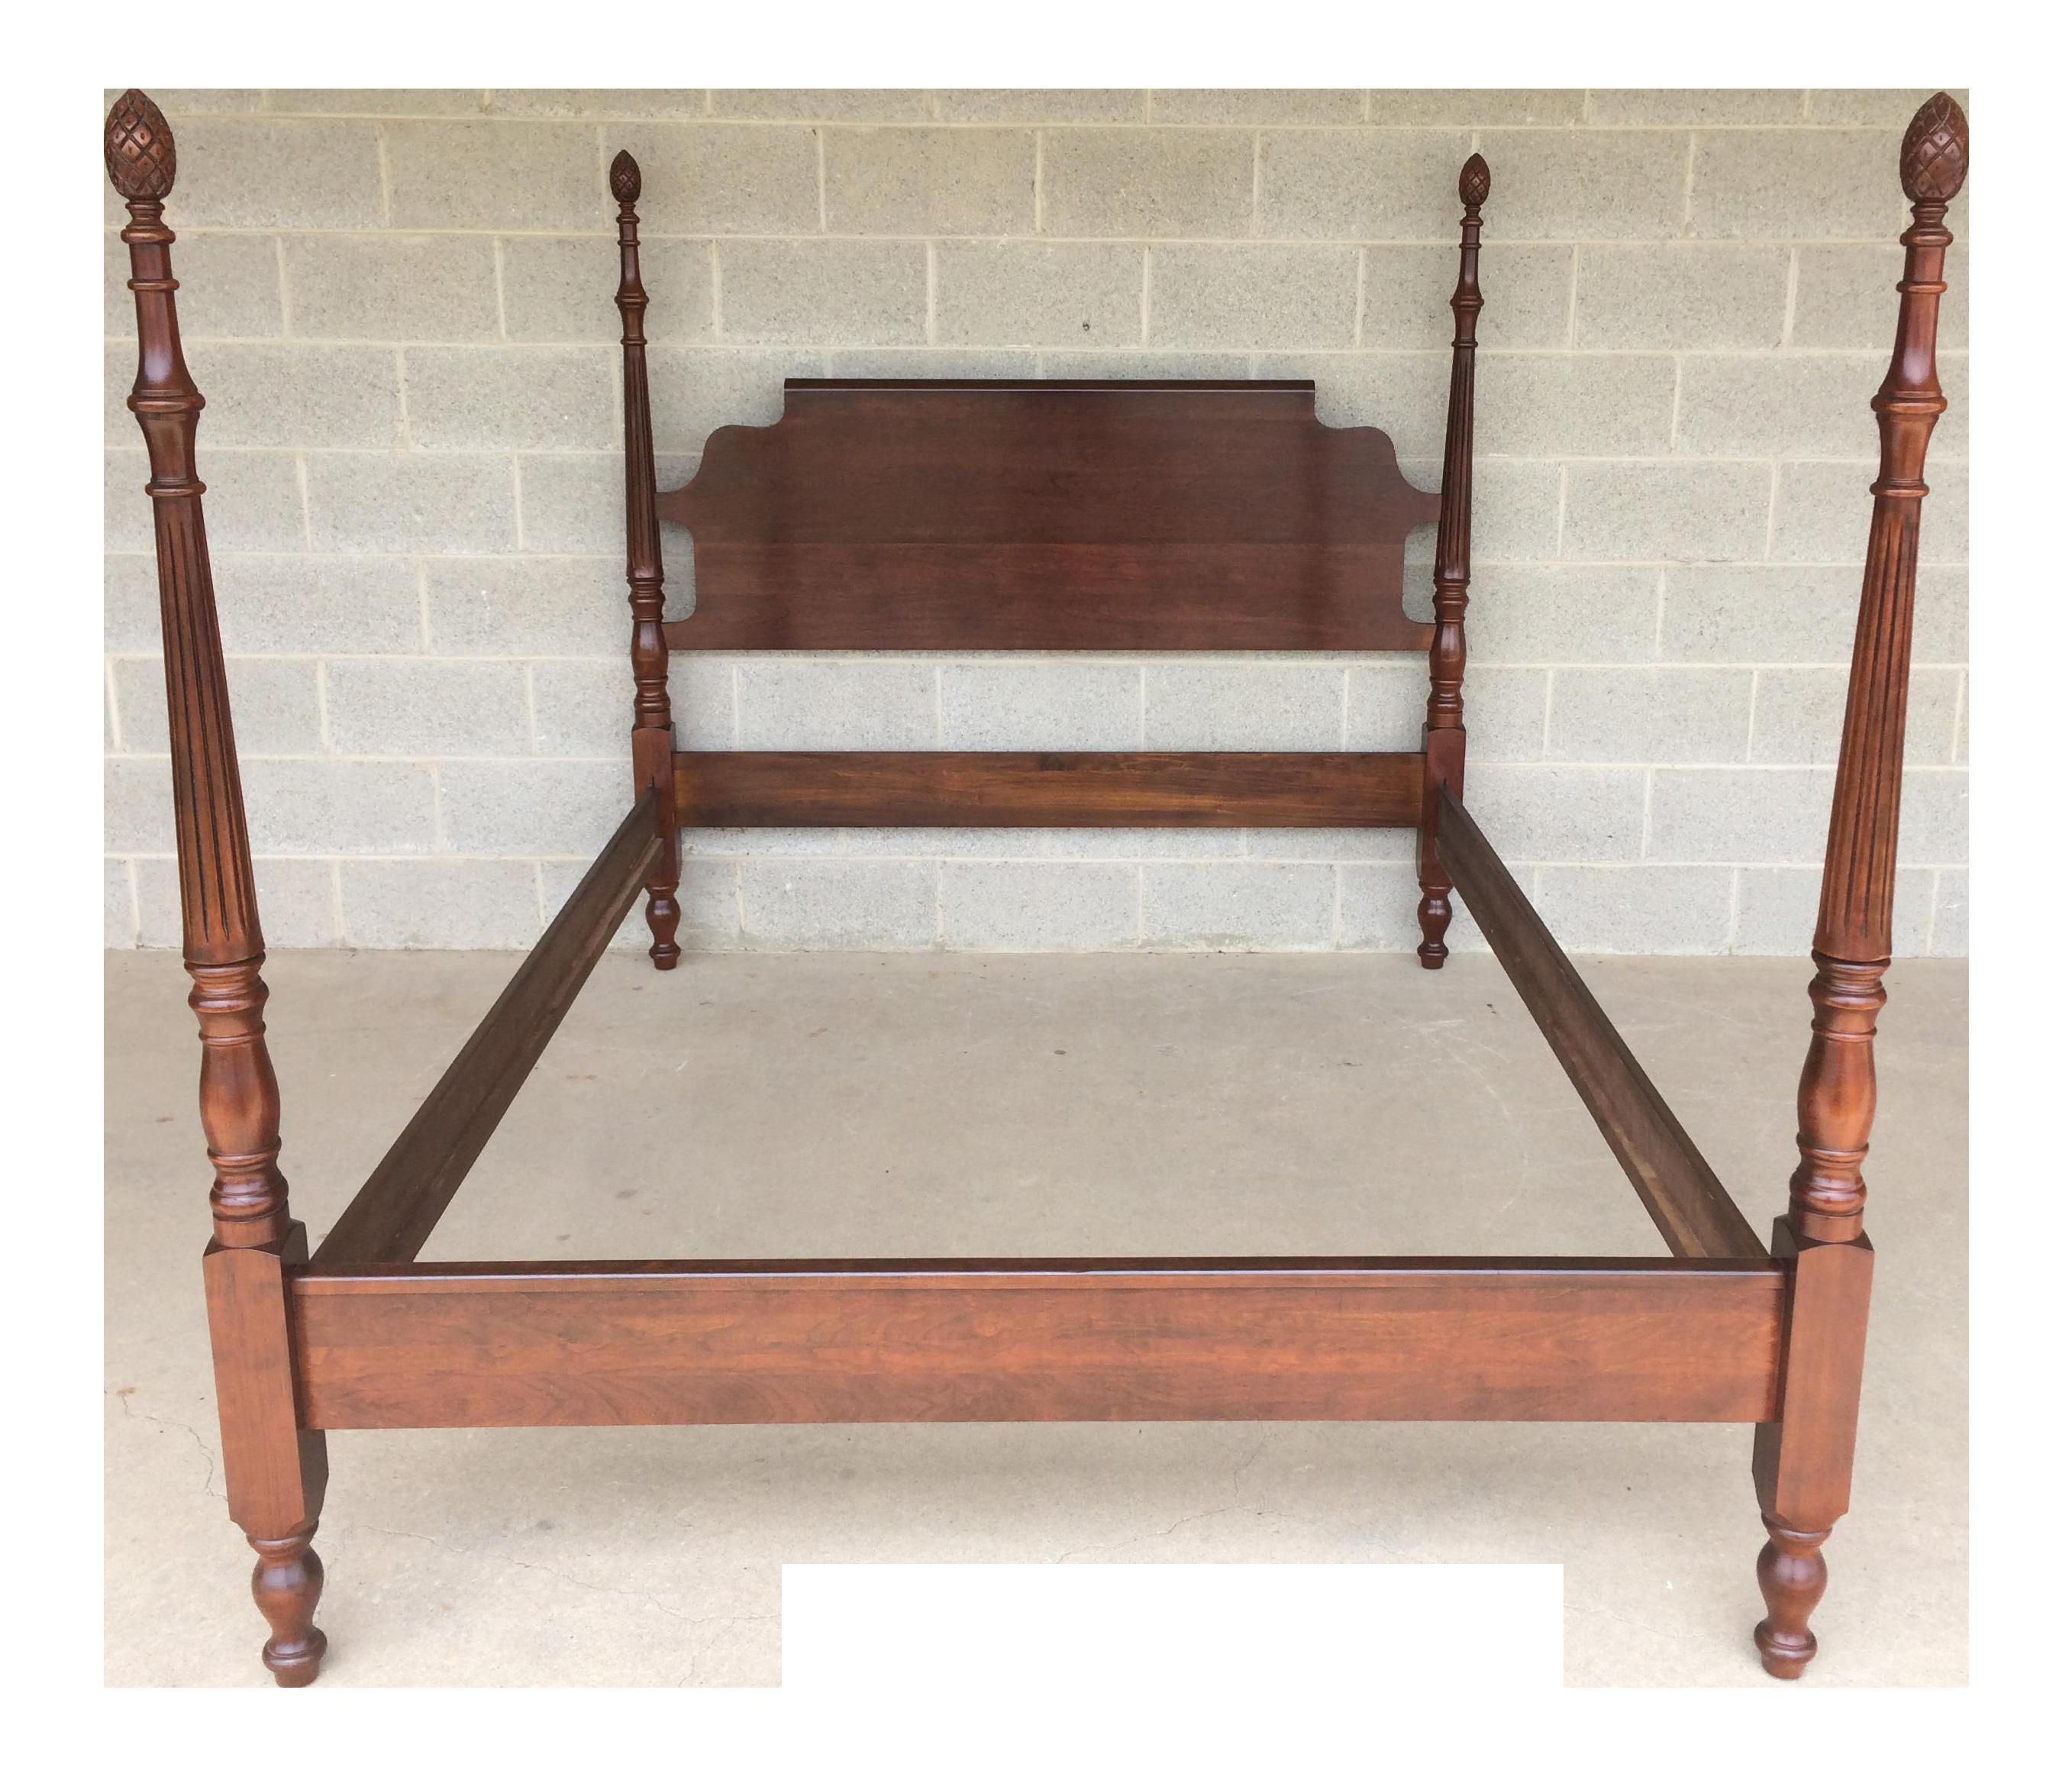 Cresent Furniture Pineapple Poster Queen Bed